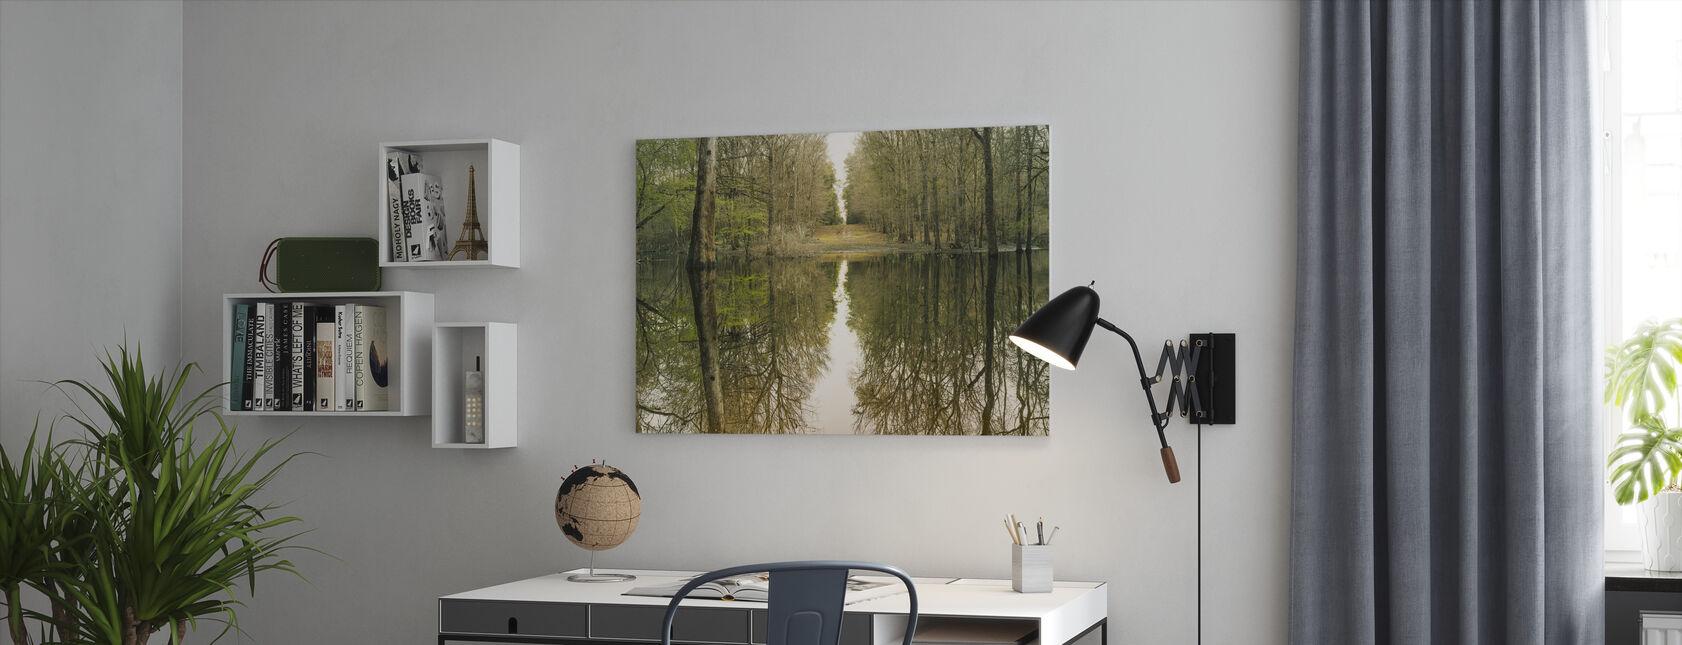 Suwanne Reflektion Panorama - Canvastavla - Kontor